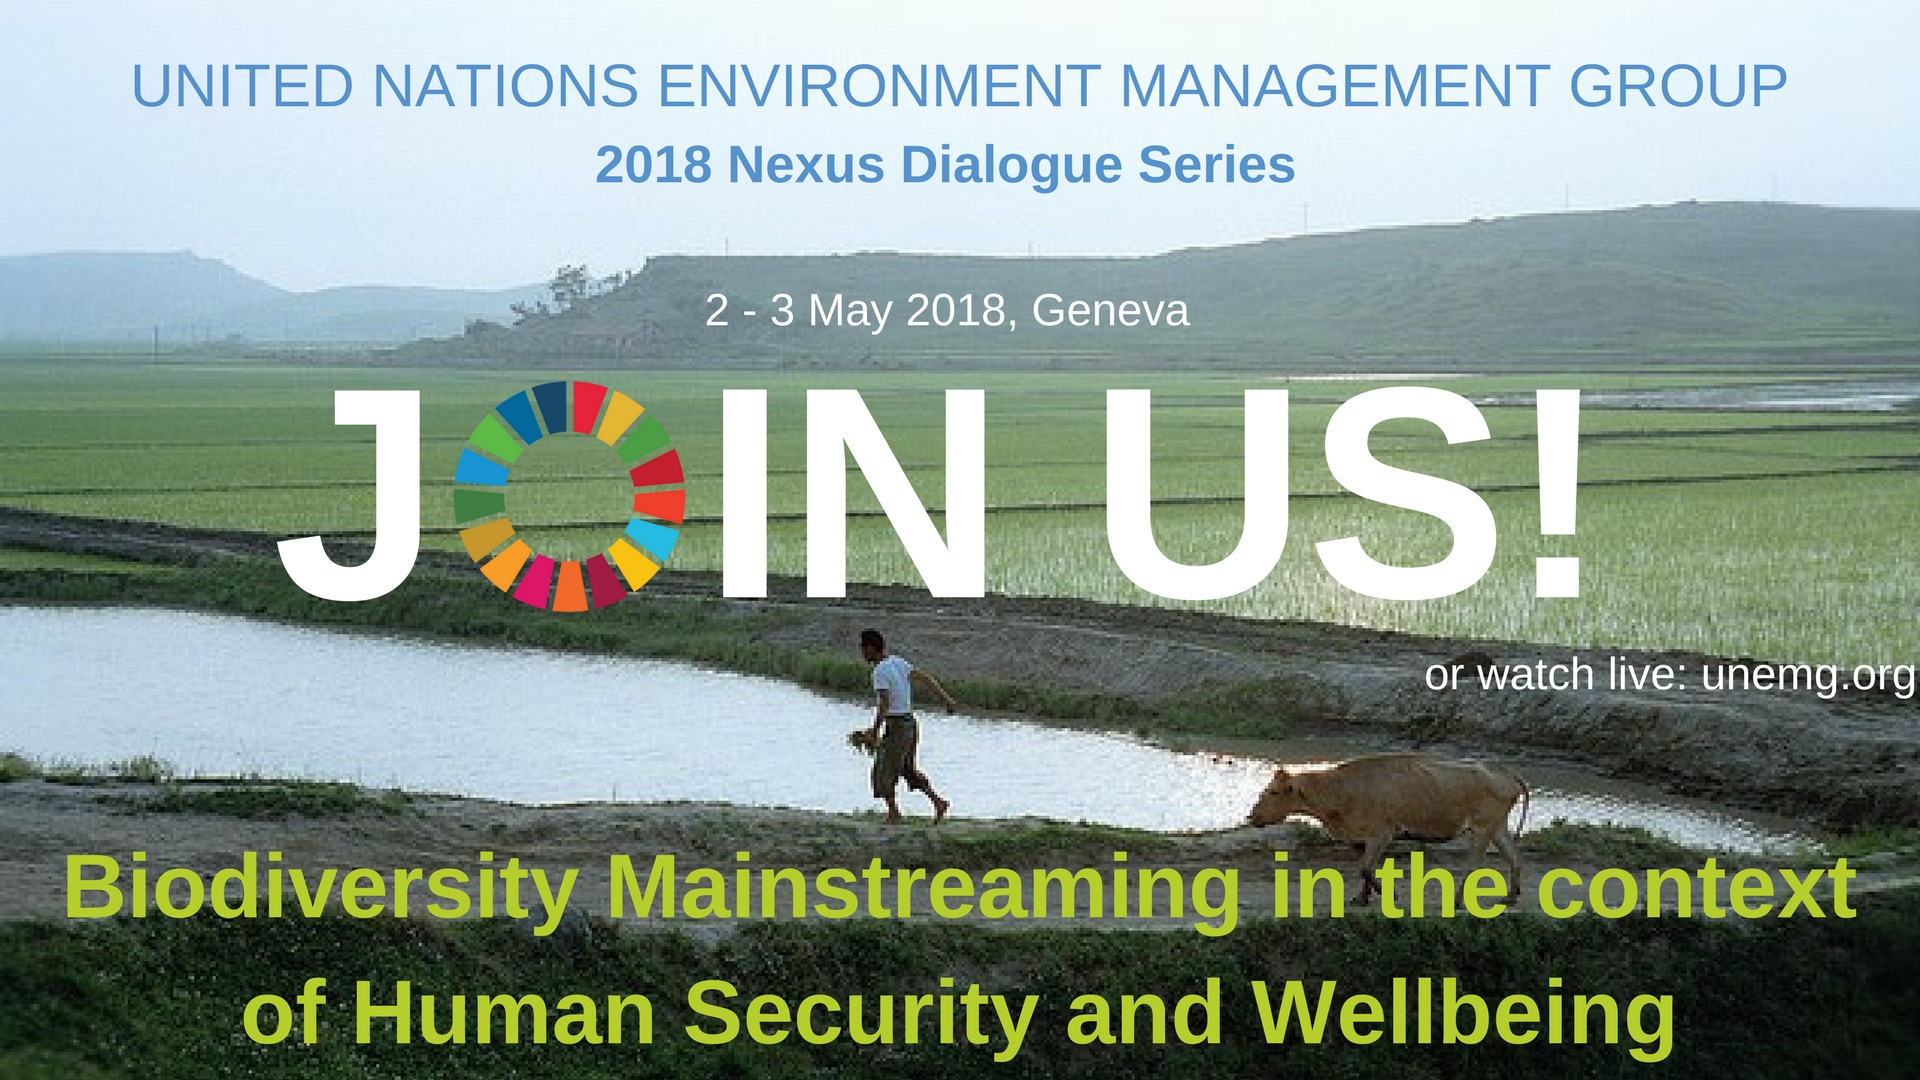 UN Environment Management Group Nexus Dialogue on Biodiversity